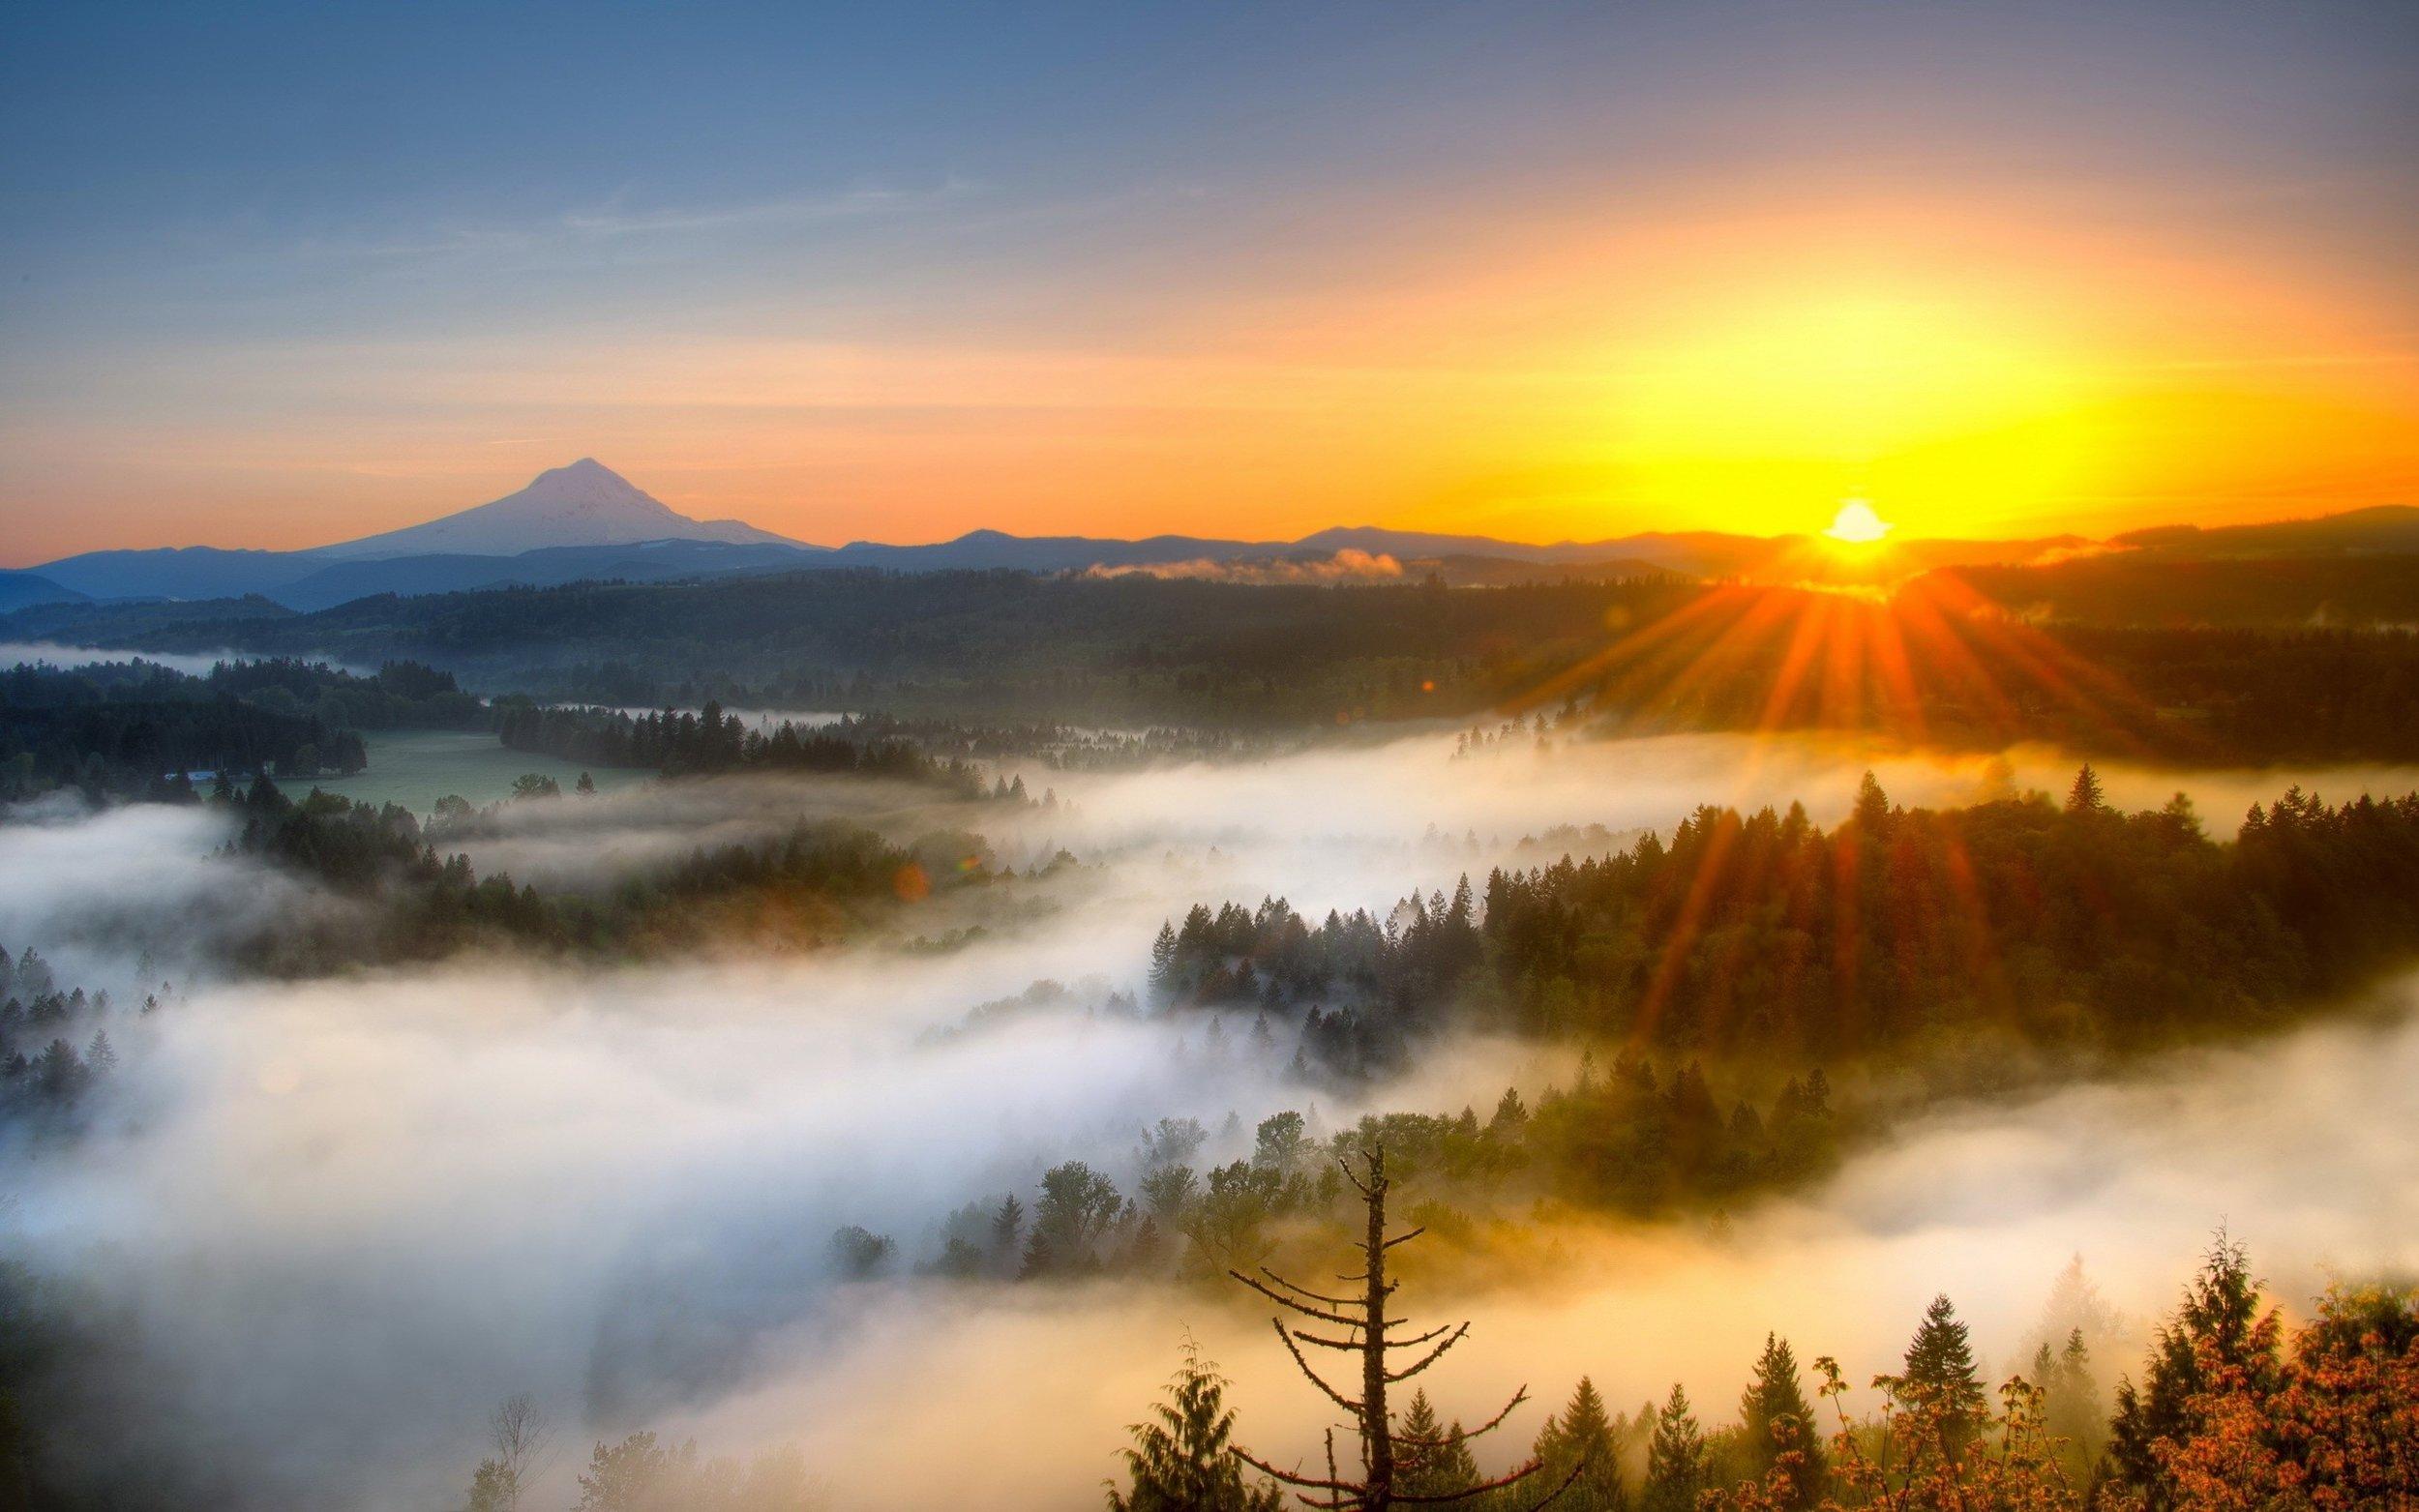 mountain-sunrise-background-wallpaper-1